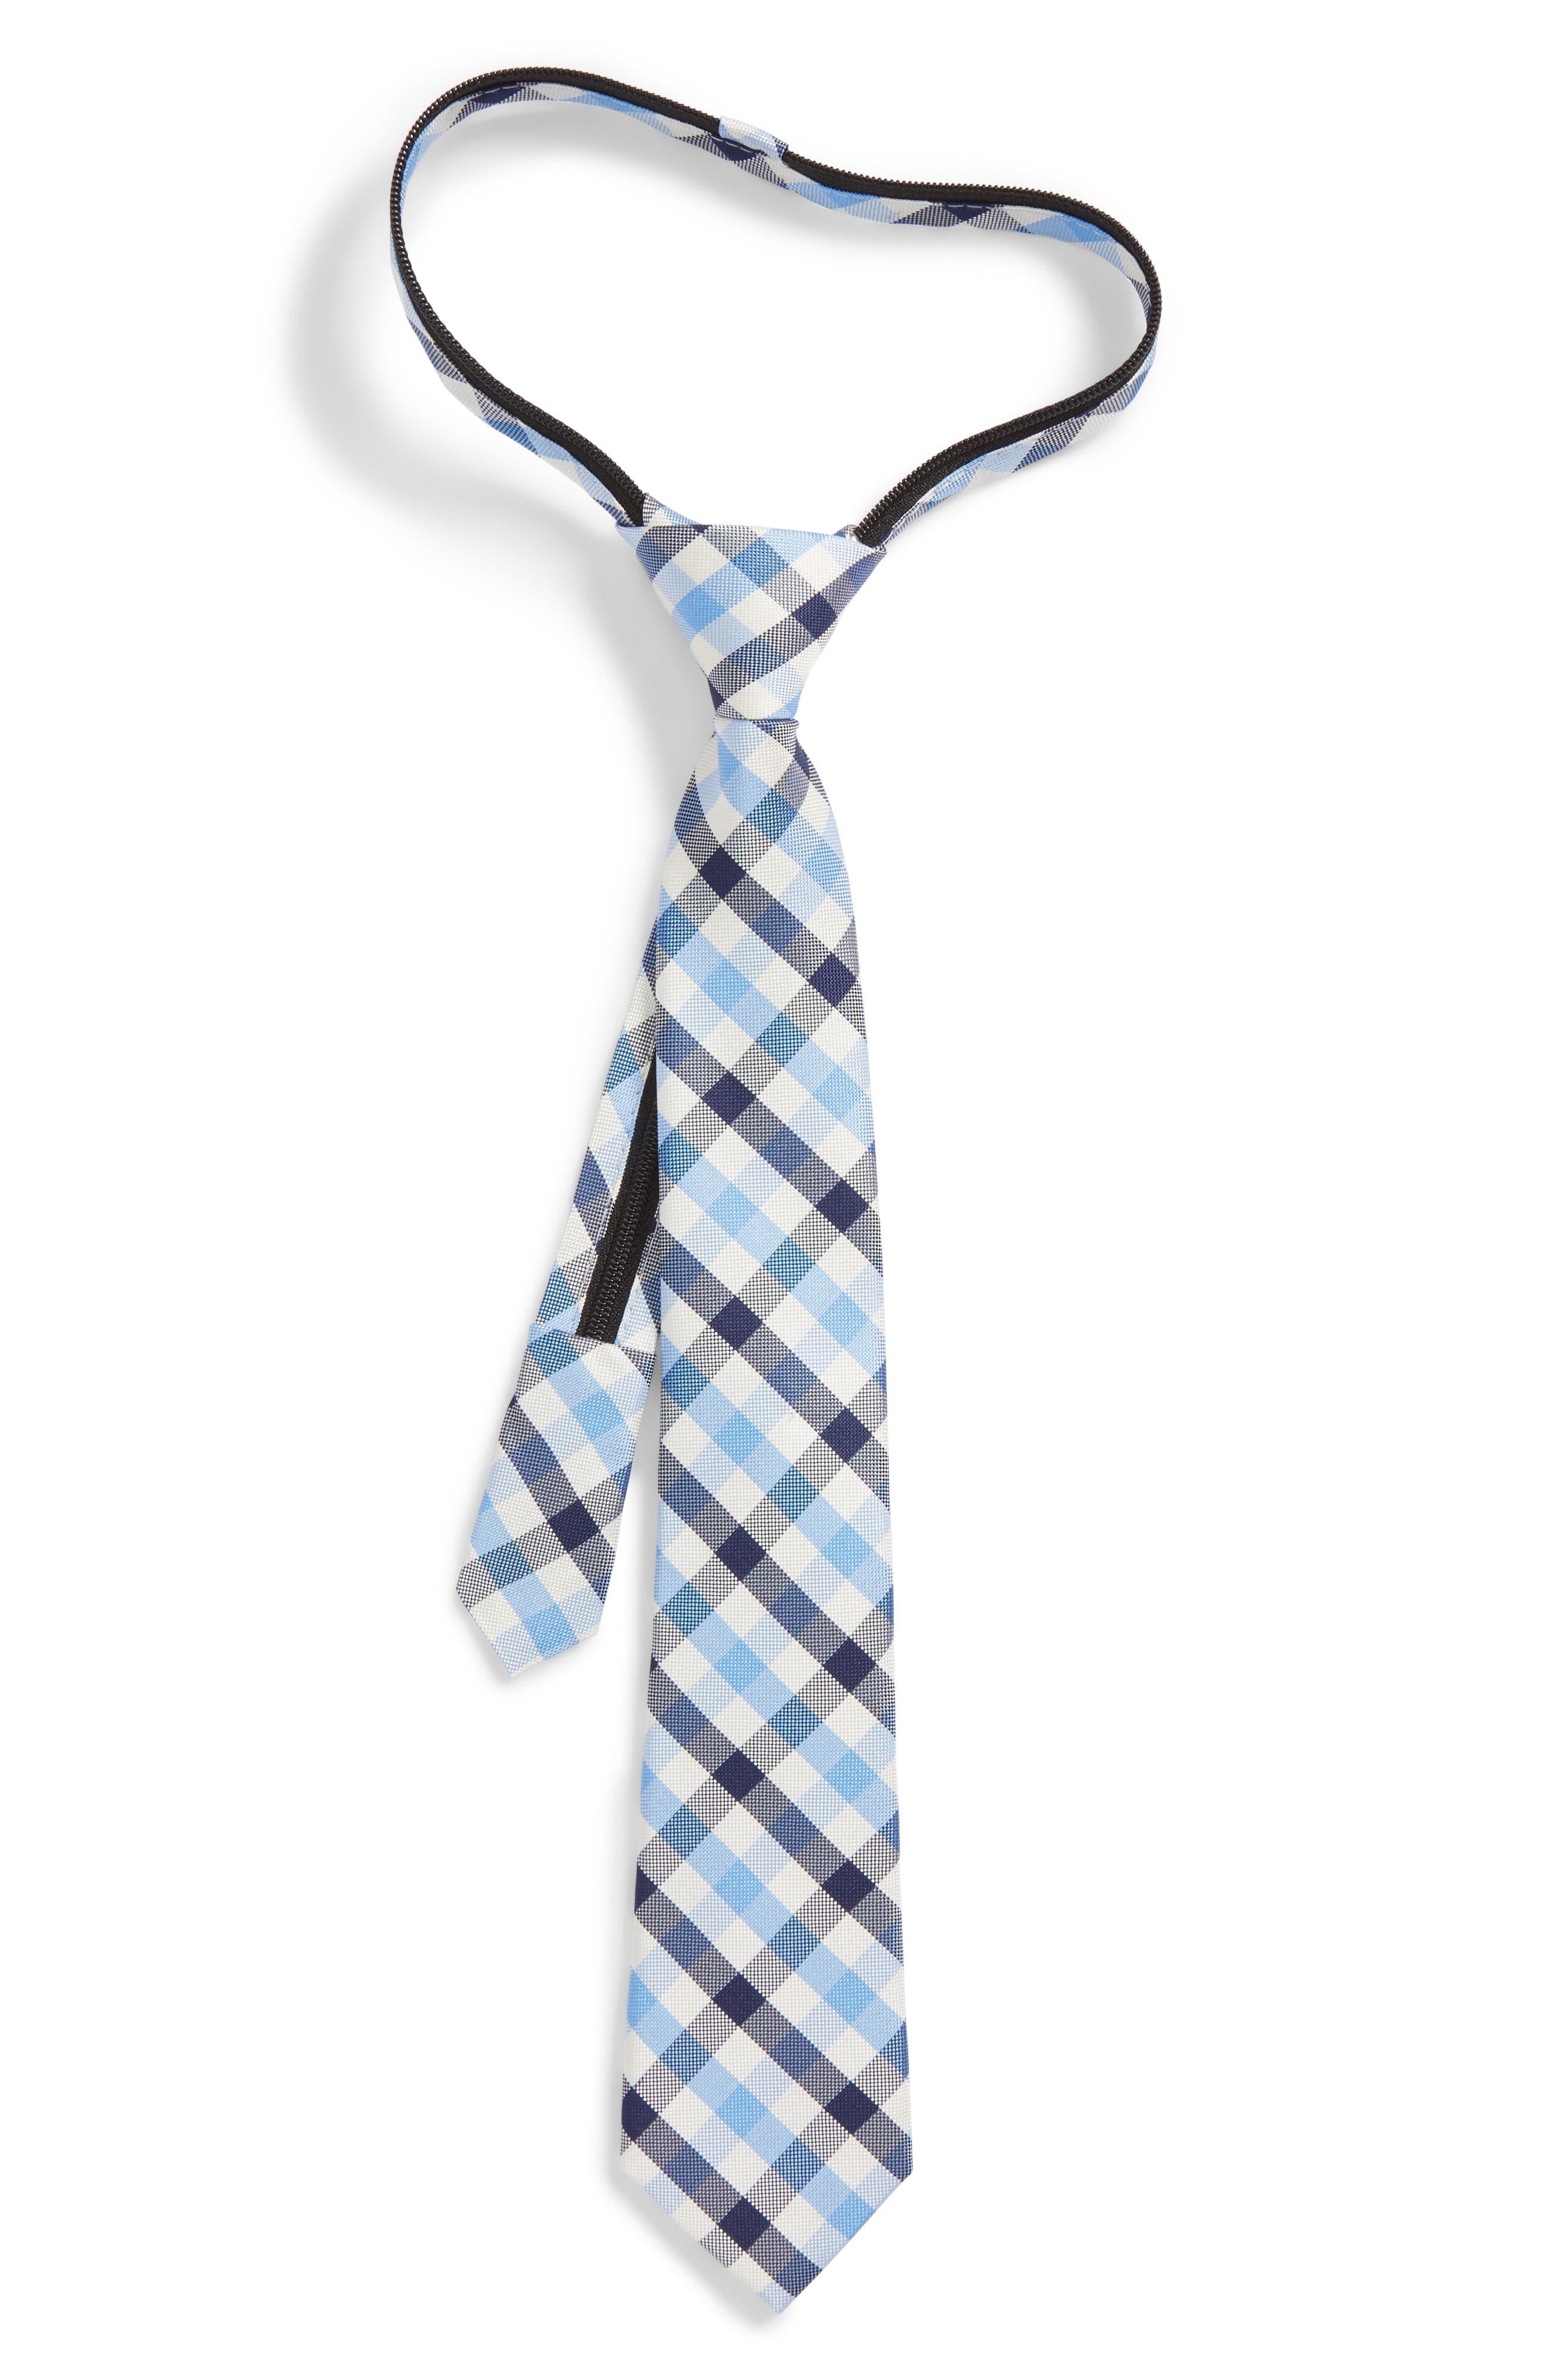 Window Plaid Silk Zip Tie,                             Main thumbnail 1, color,                             455